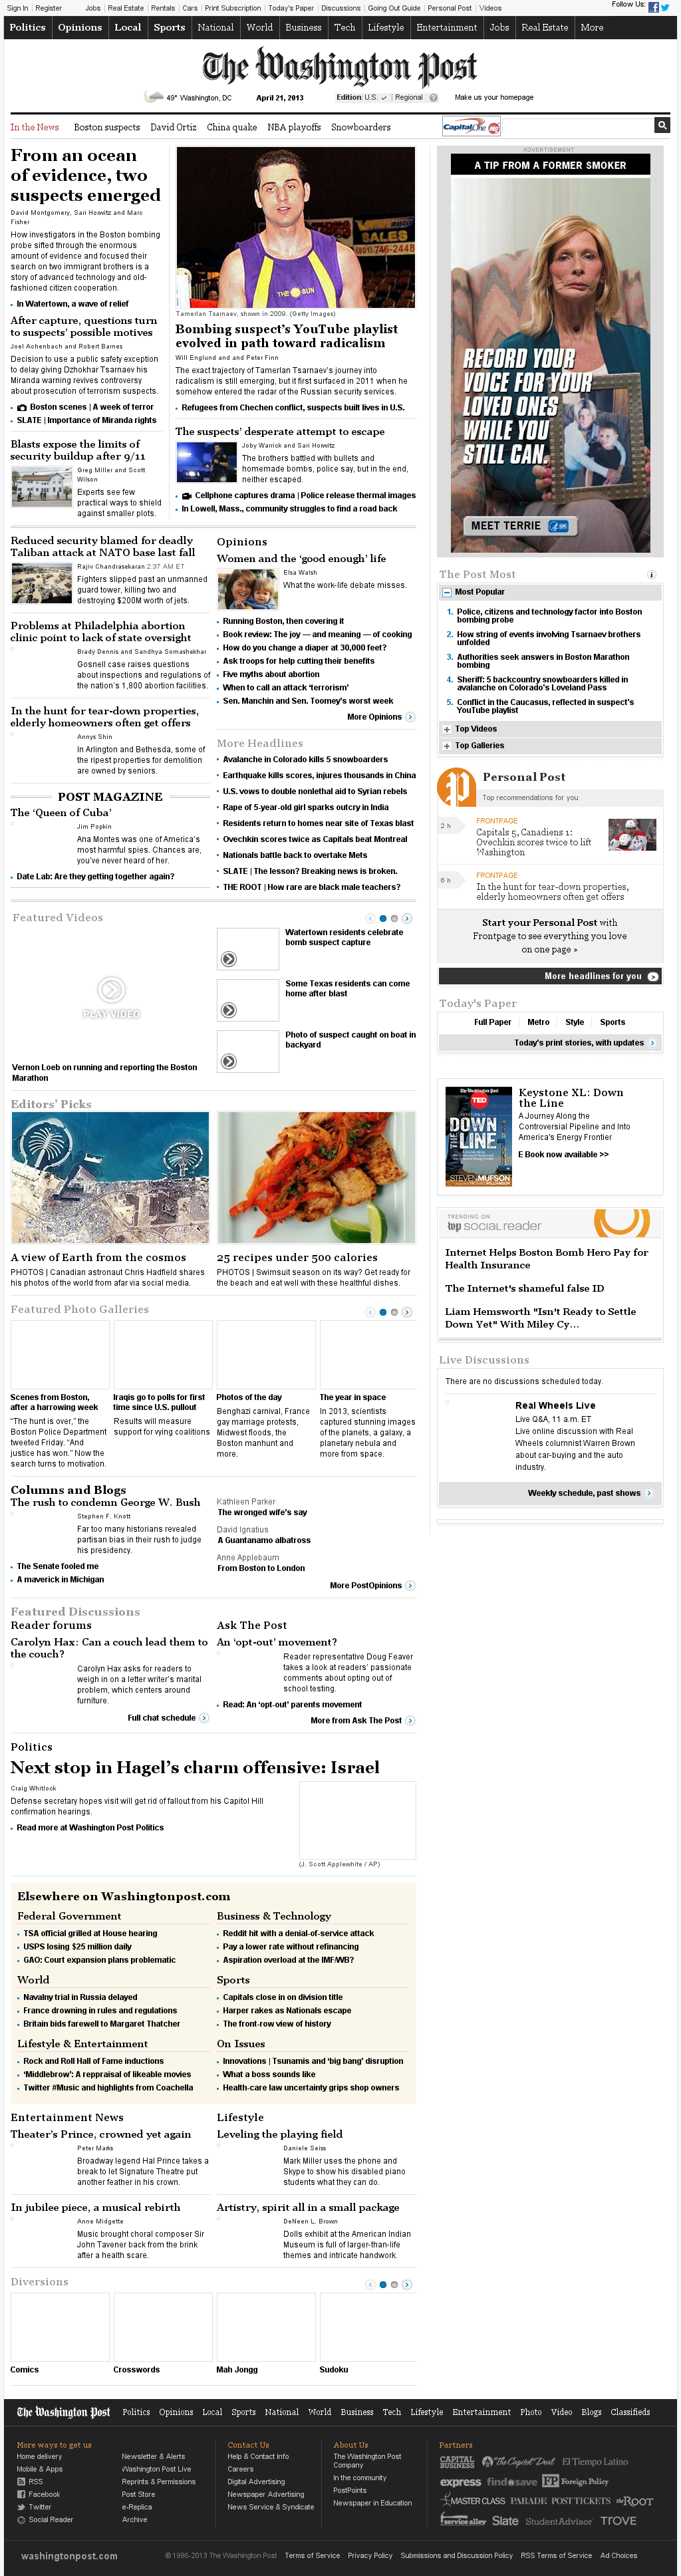 The Washington Post at Sunday April 21, 2013, 5:23 a.m. UTC